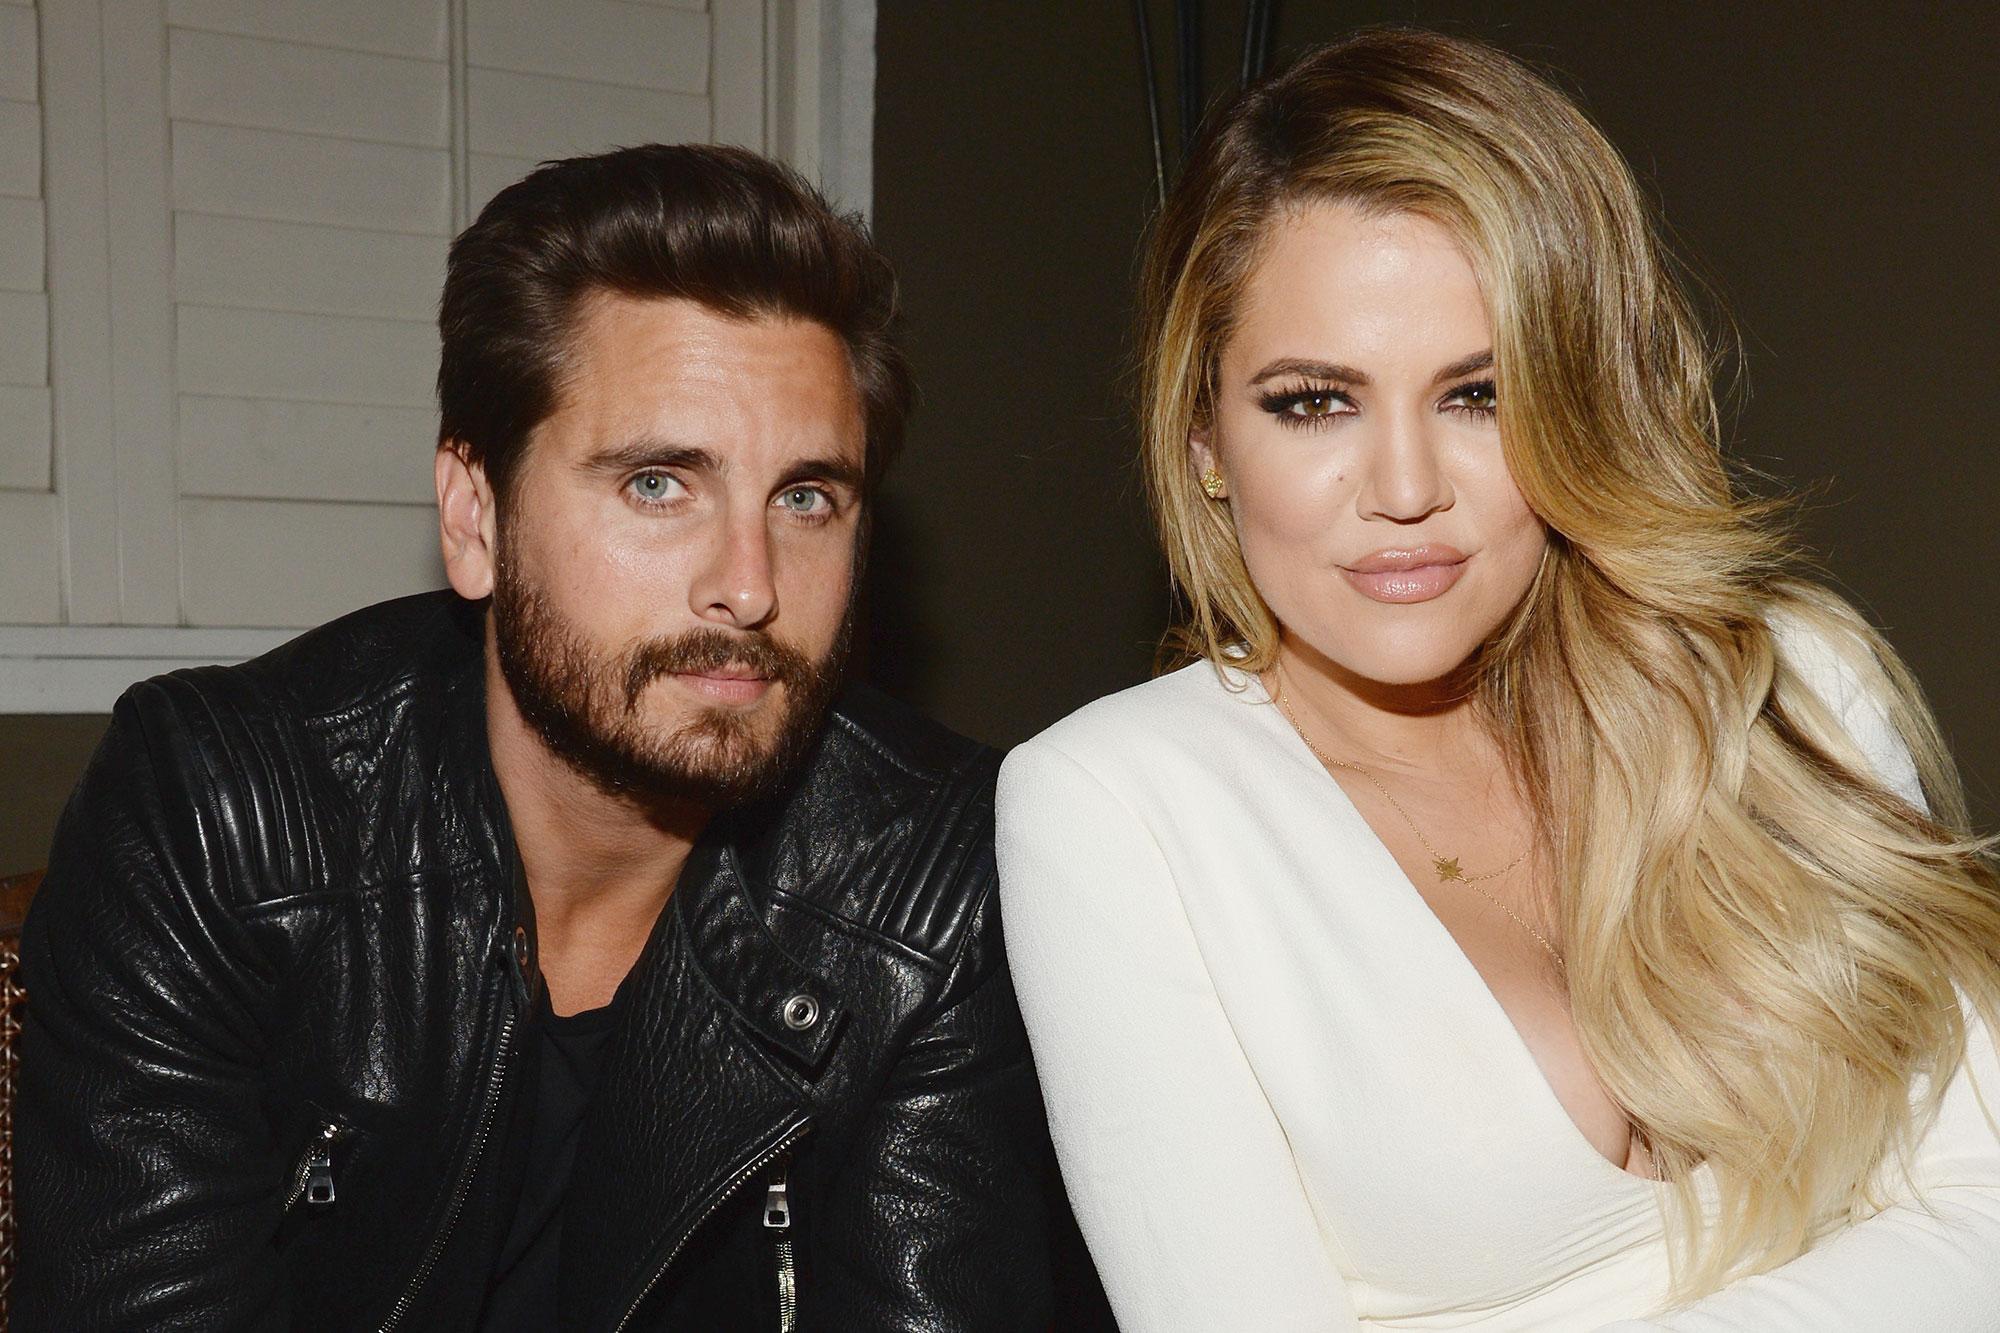 Scott Disick Is Crushing On Khloe Kardashian - The KUWK Star Plans To Ignore Tristan Thompson's Birthday